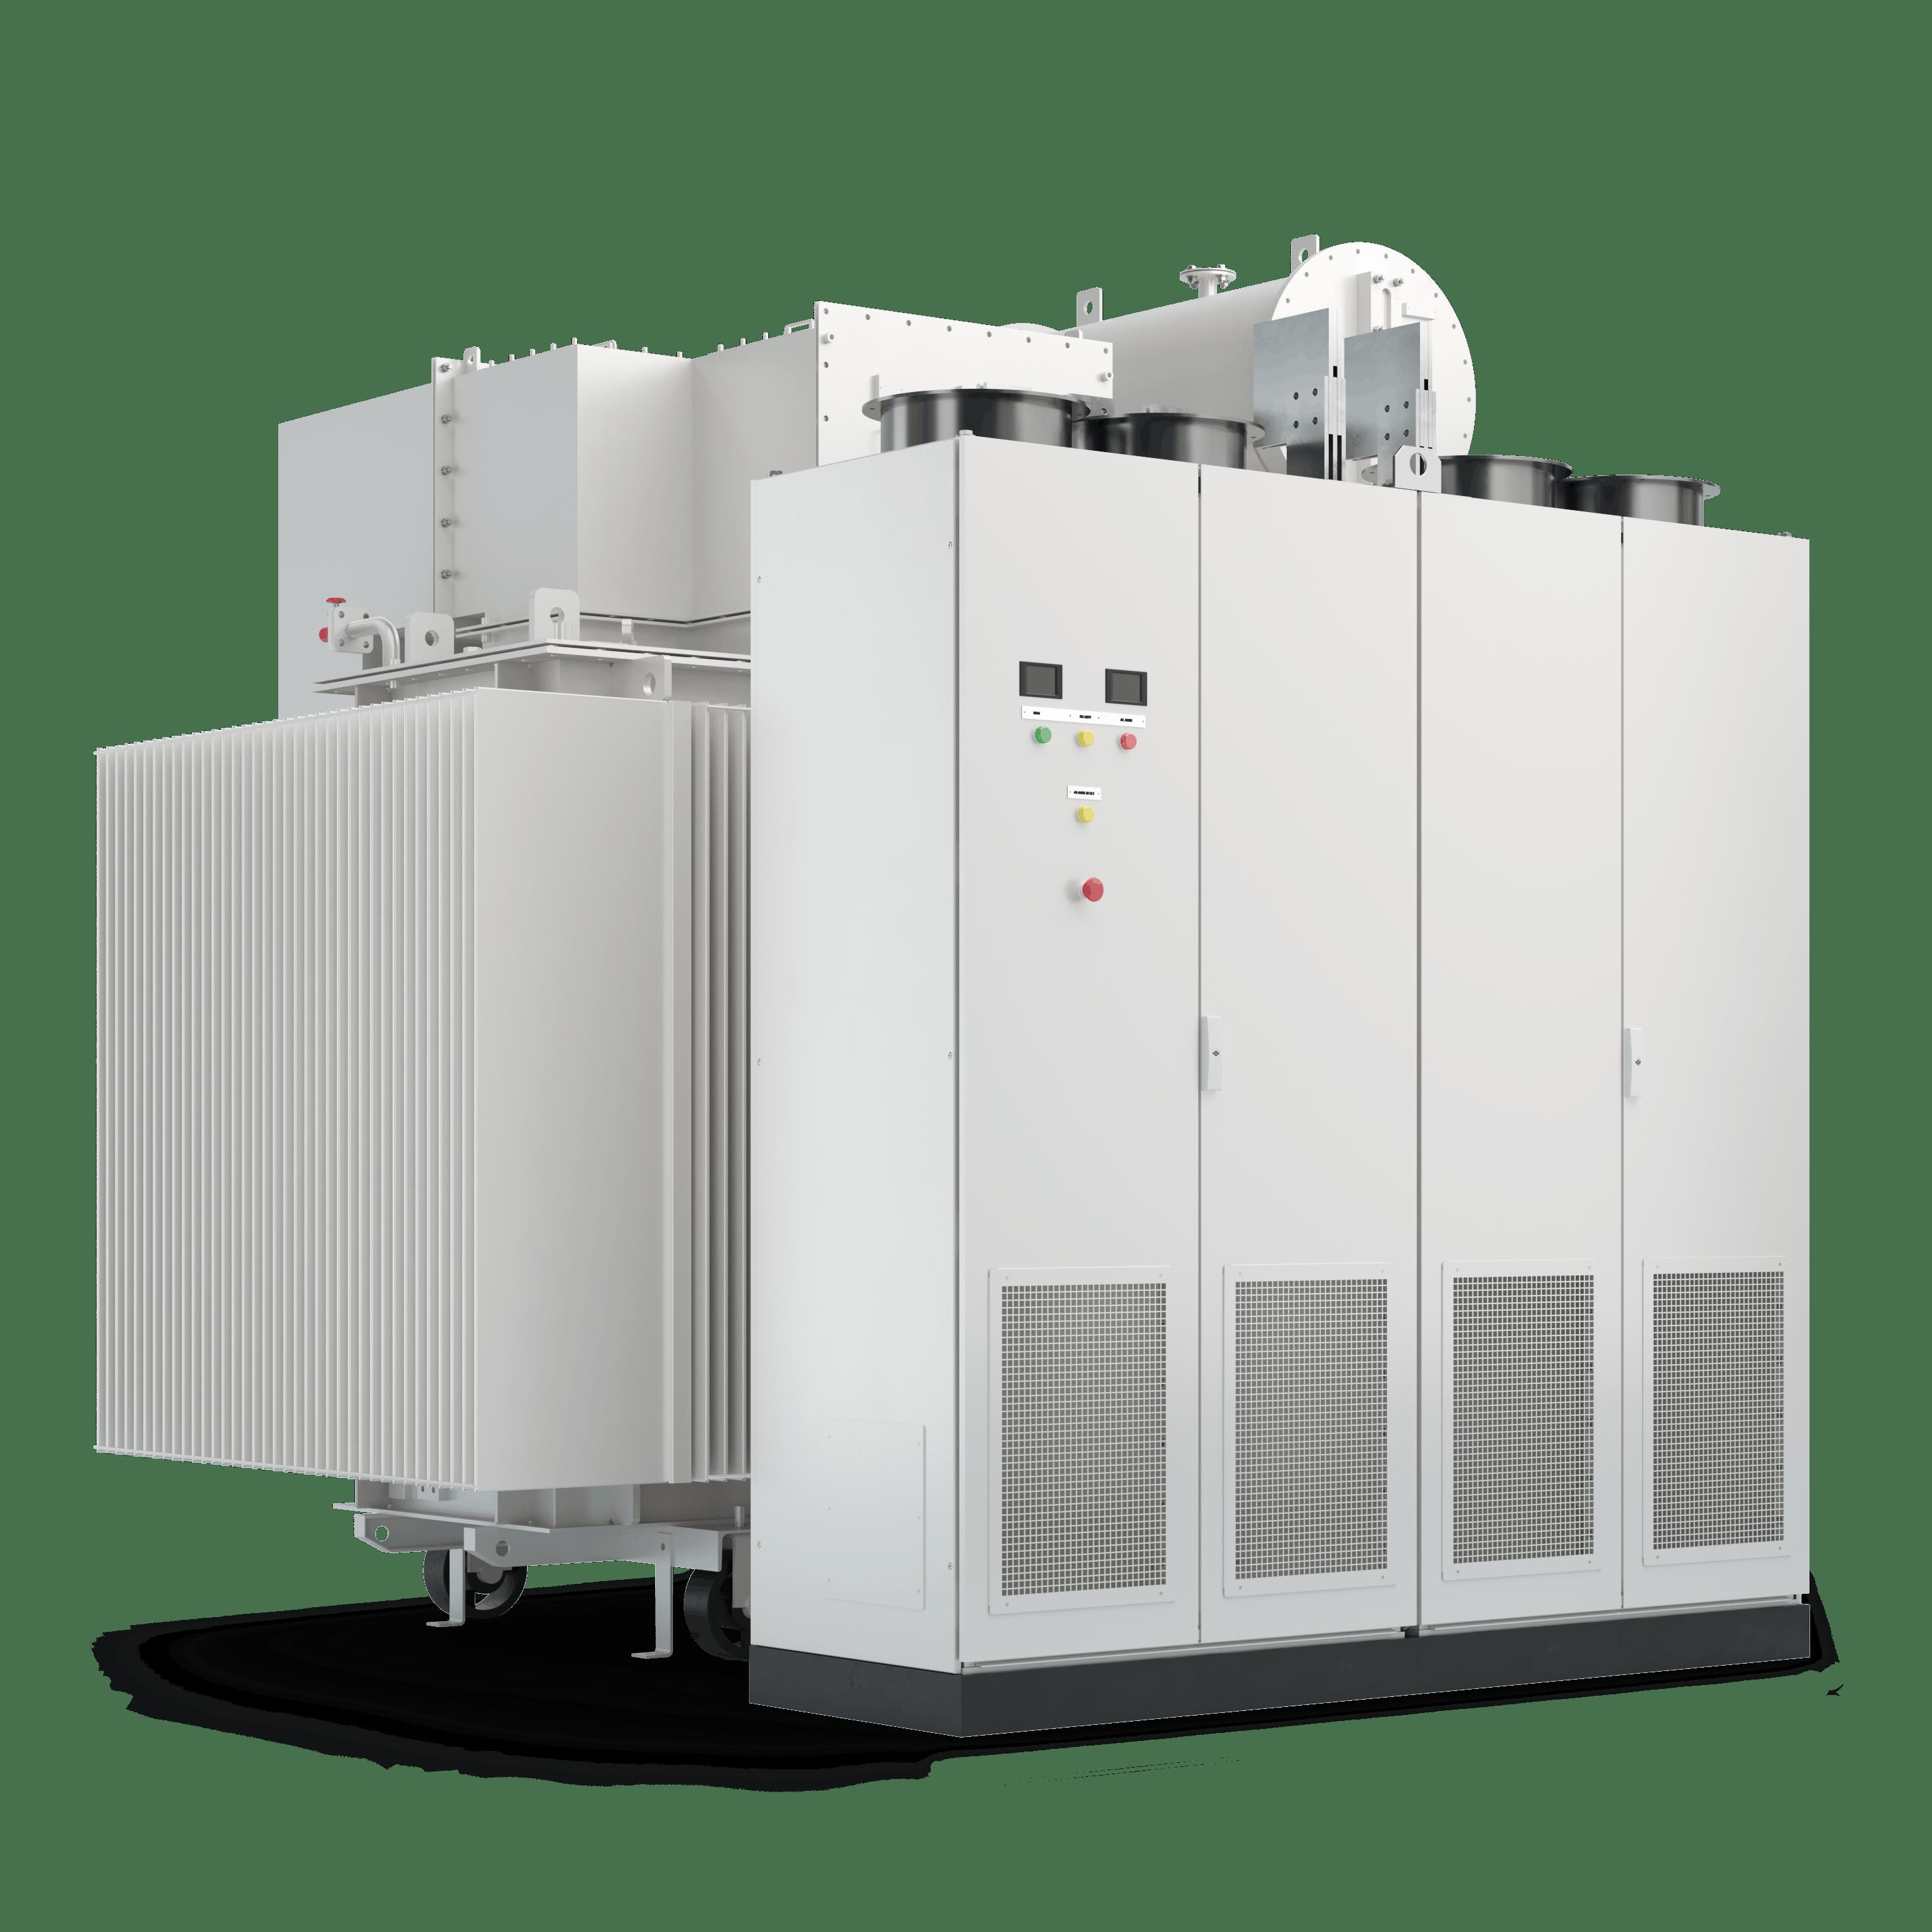 PowerKraft Rectifier for Hydrogen Production